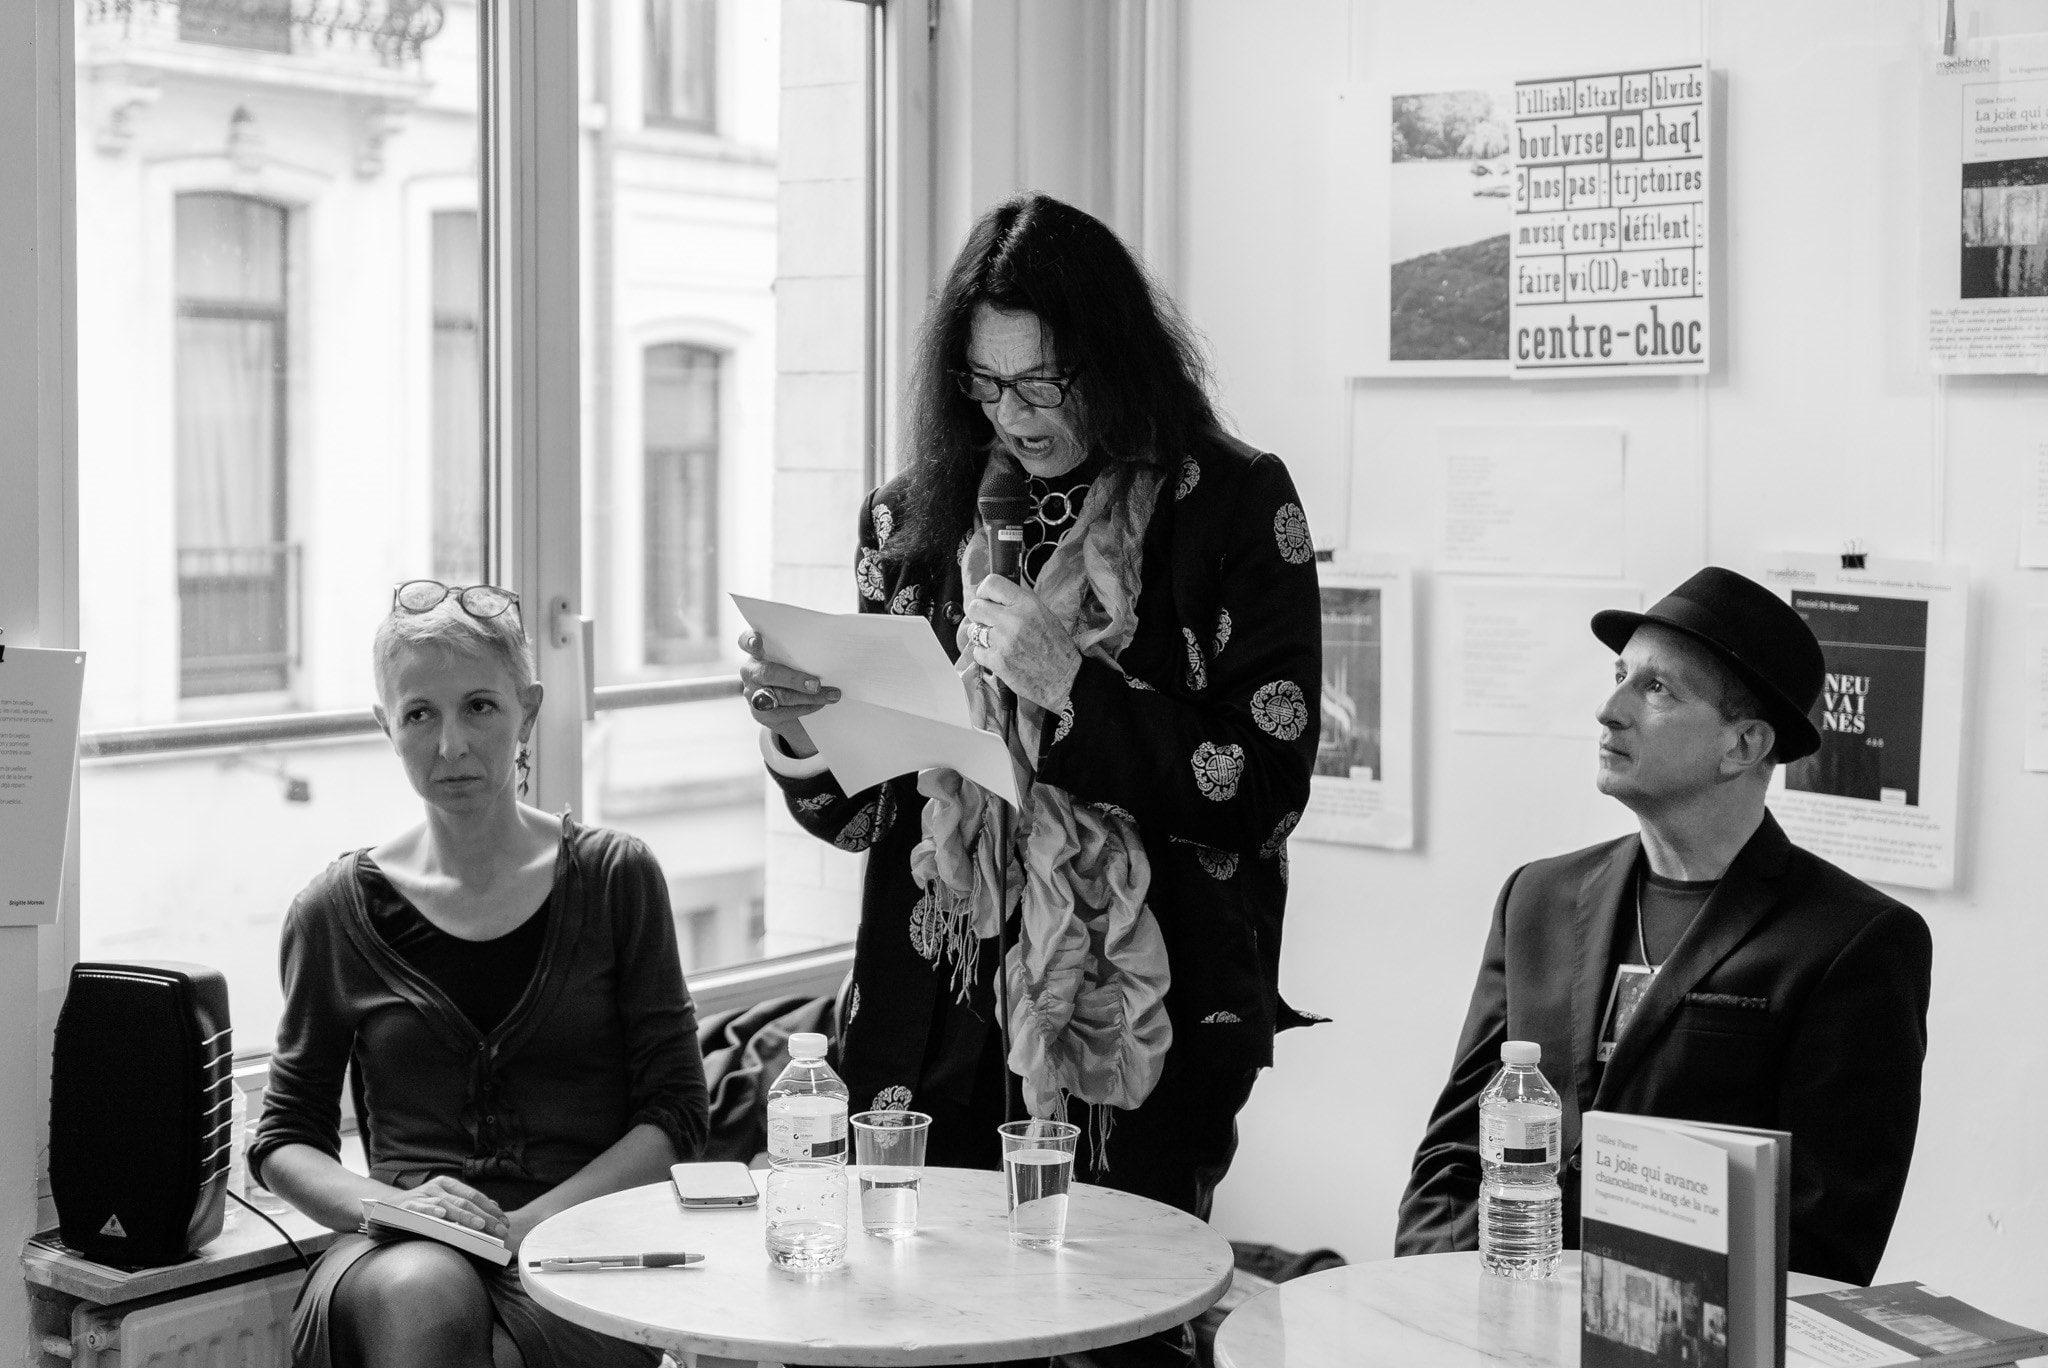 La Joie qui avance chancelante le long de la rue image GILLES FARCET et Anne Waldman (c) John Sellekaers fiEstival maelstrÖm reEvolution 2017 02